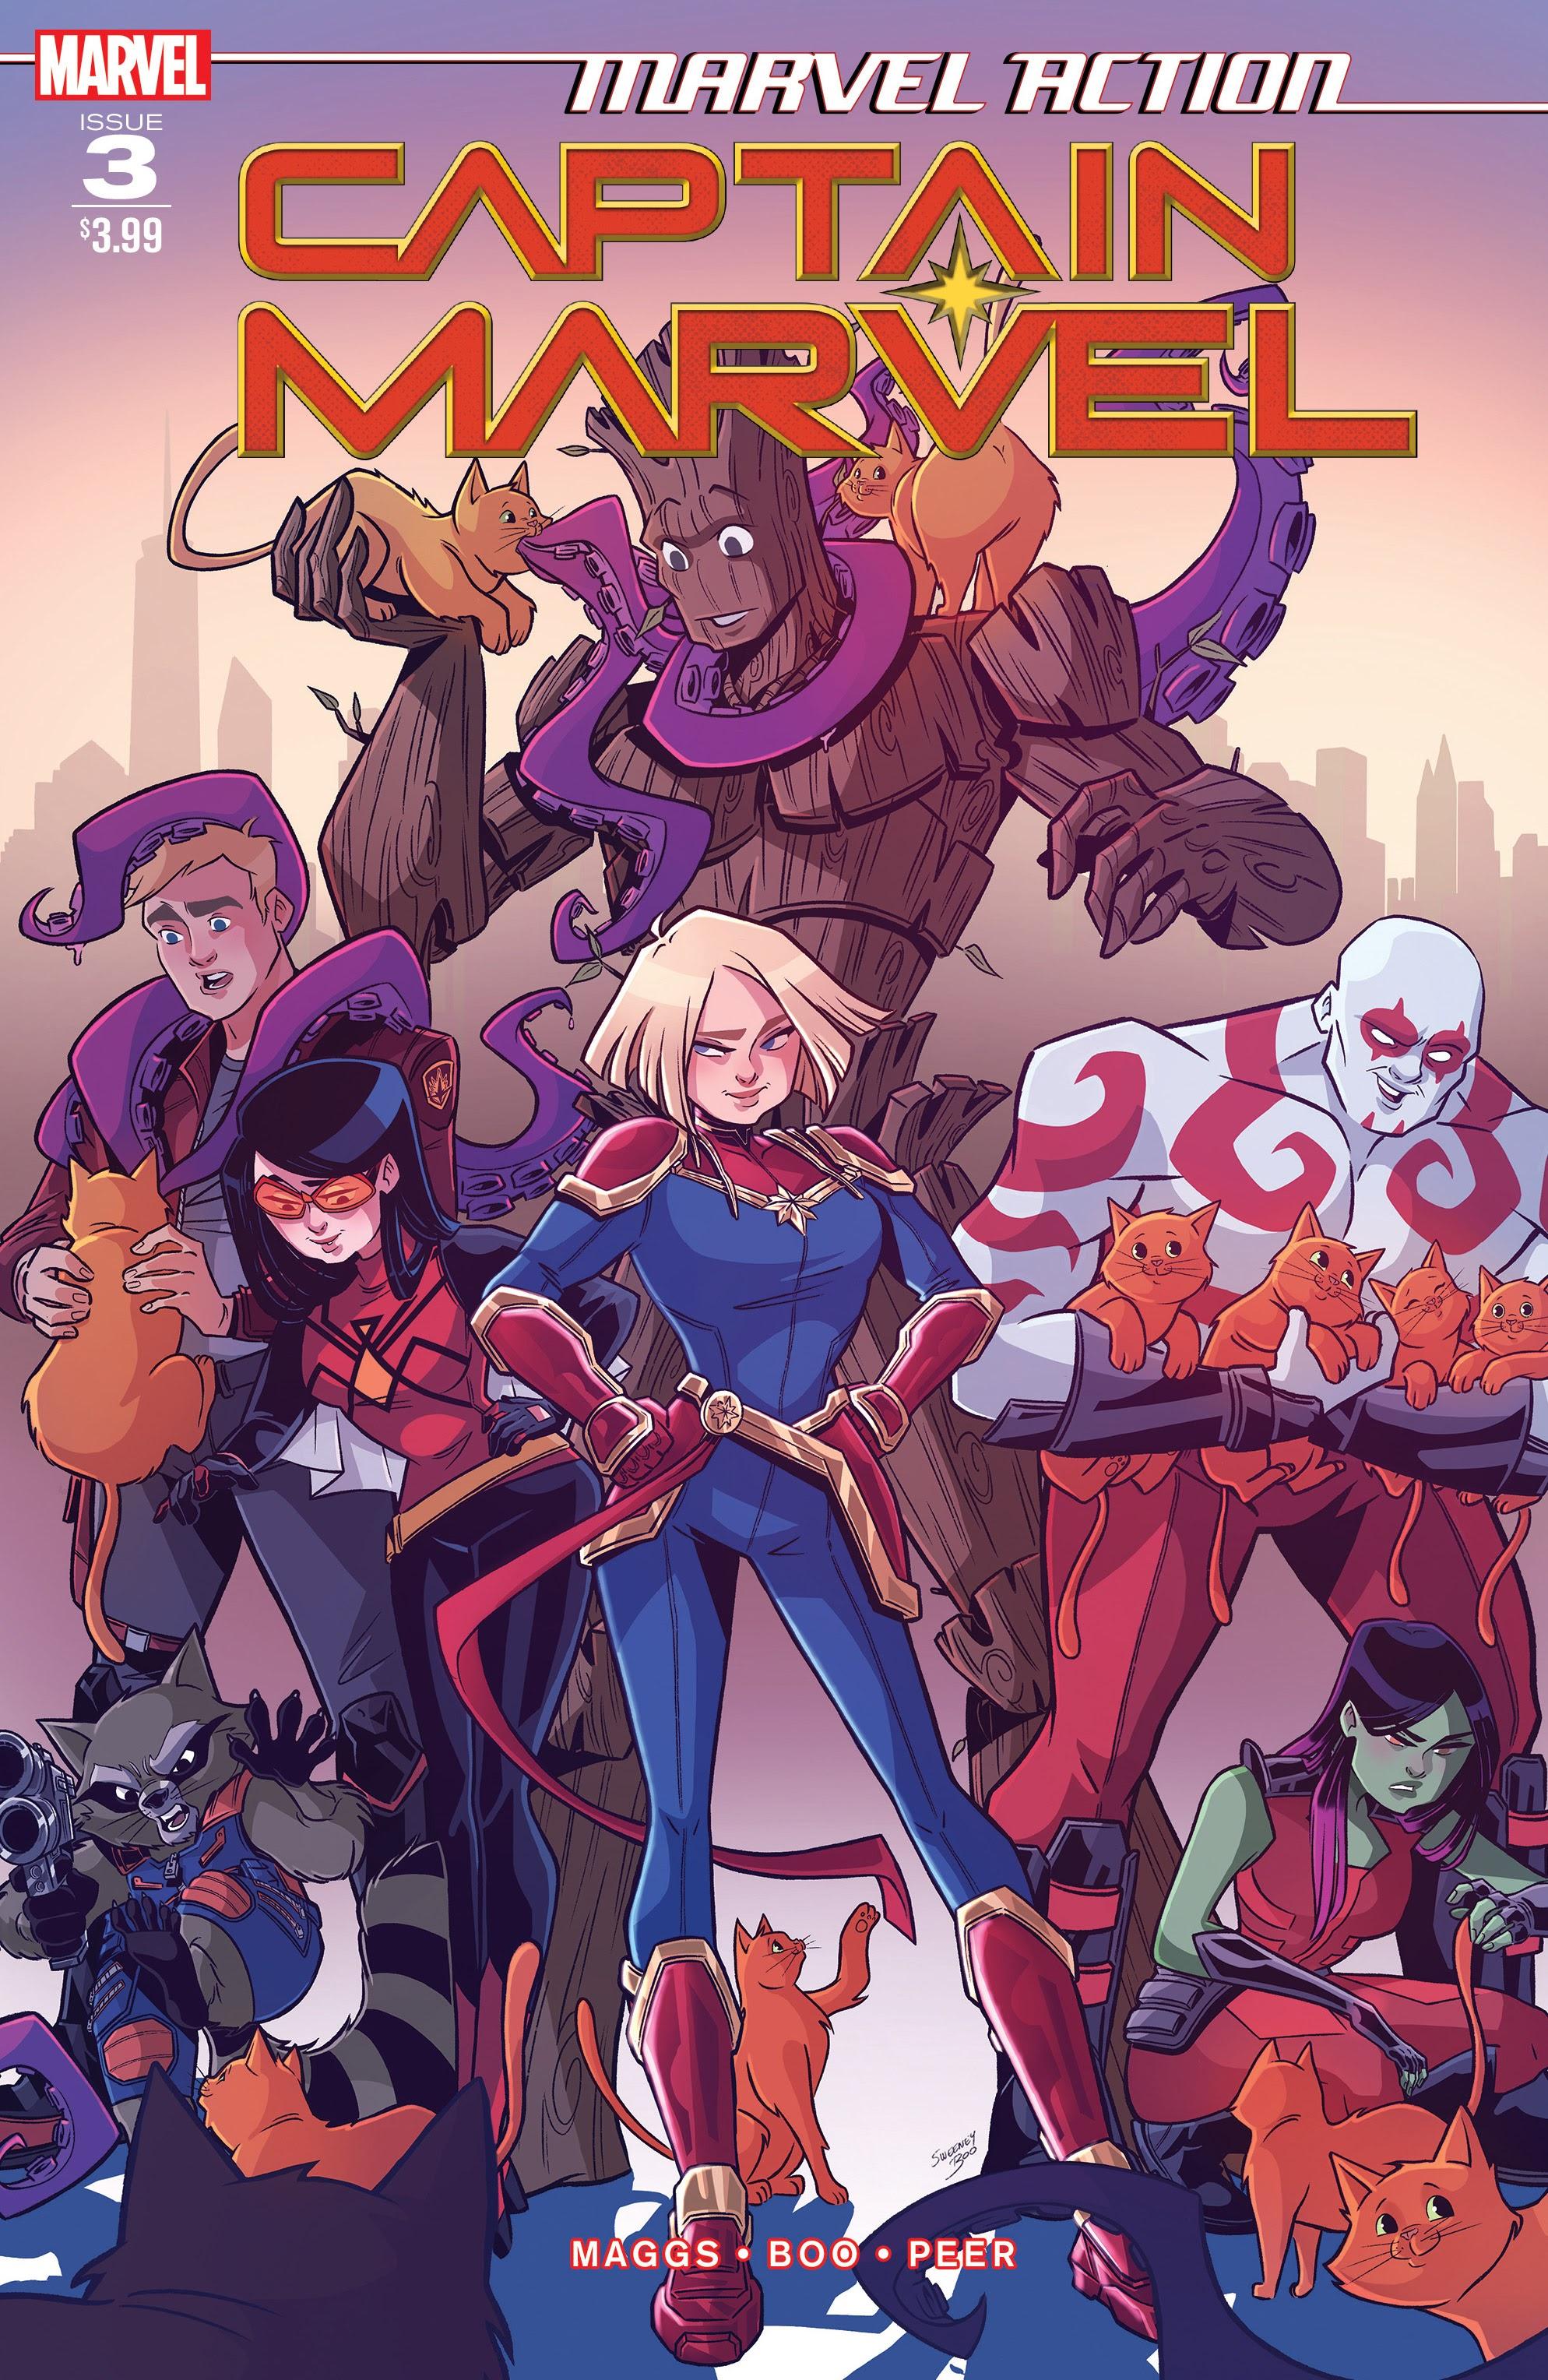 Marvel Action: Captain Marvel Vol 1 3